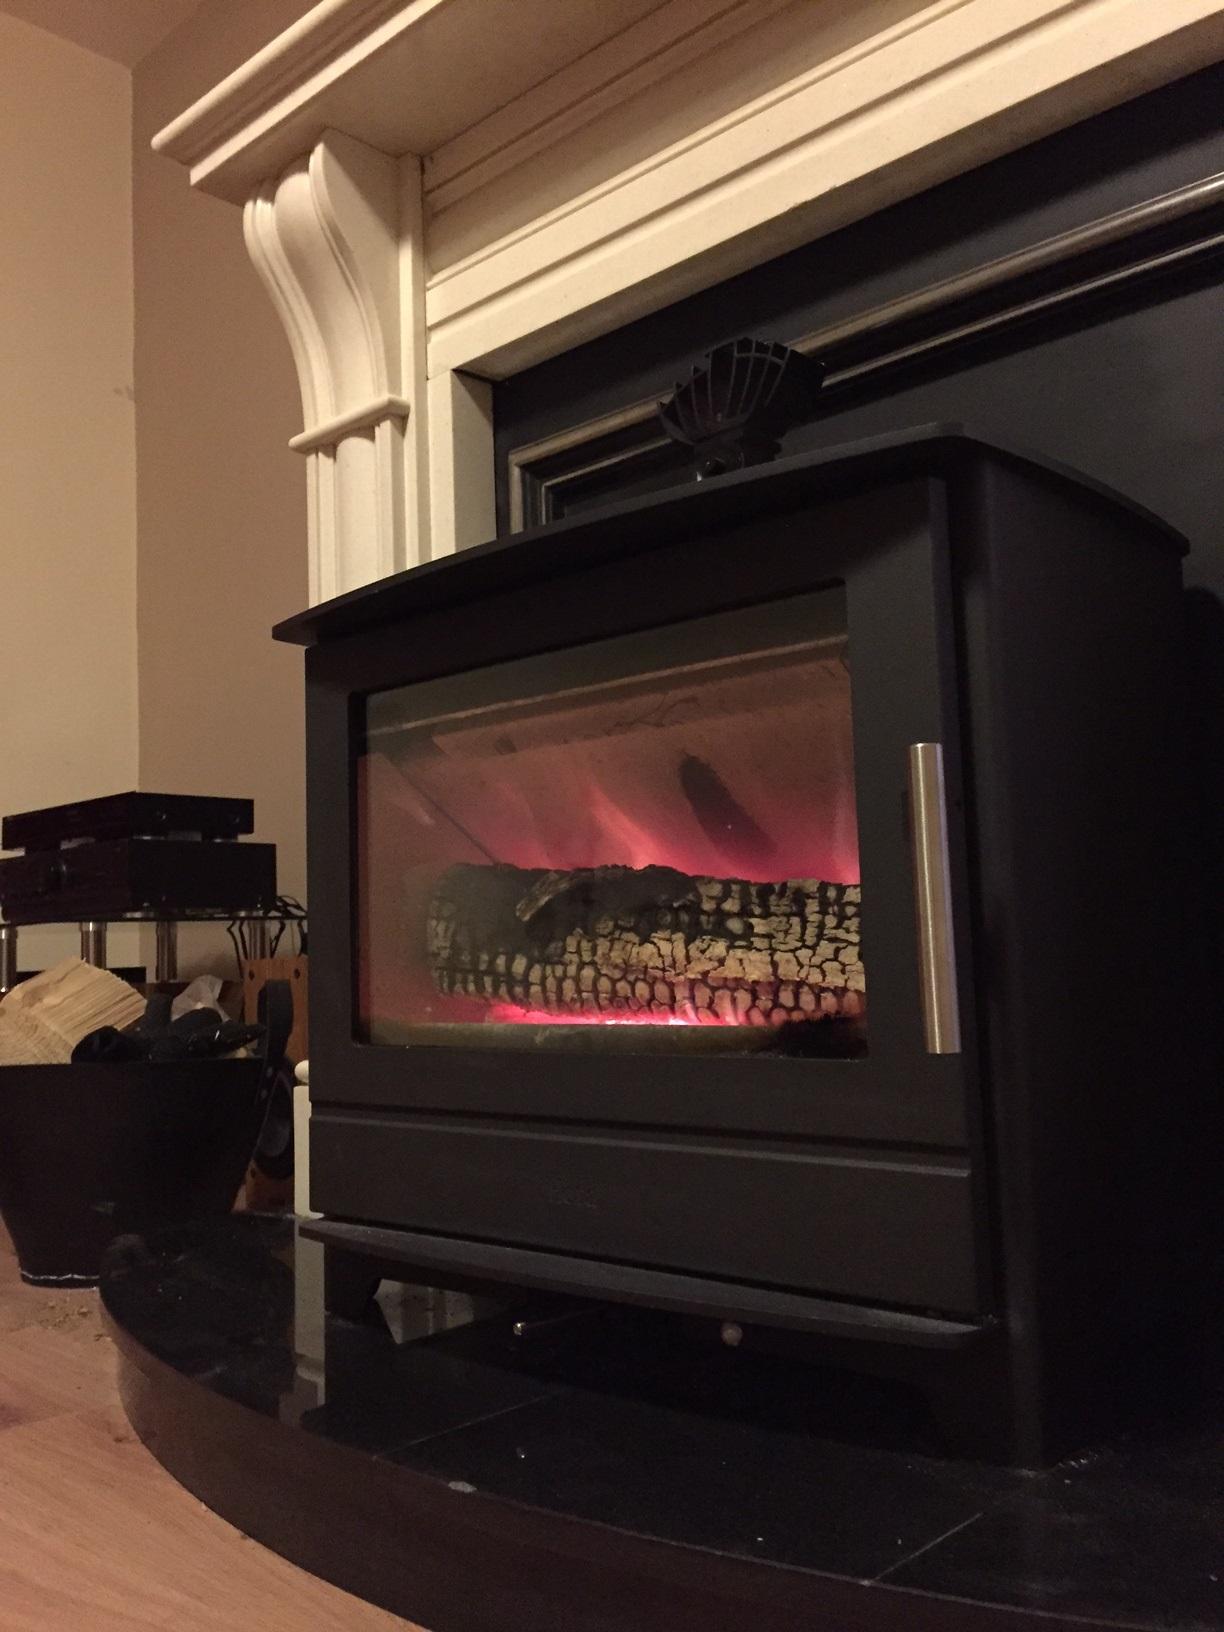 Heta Inspire 55 with half meter log burning